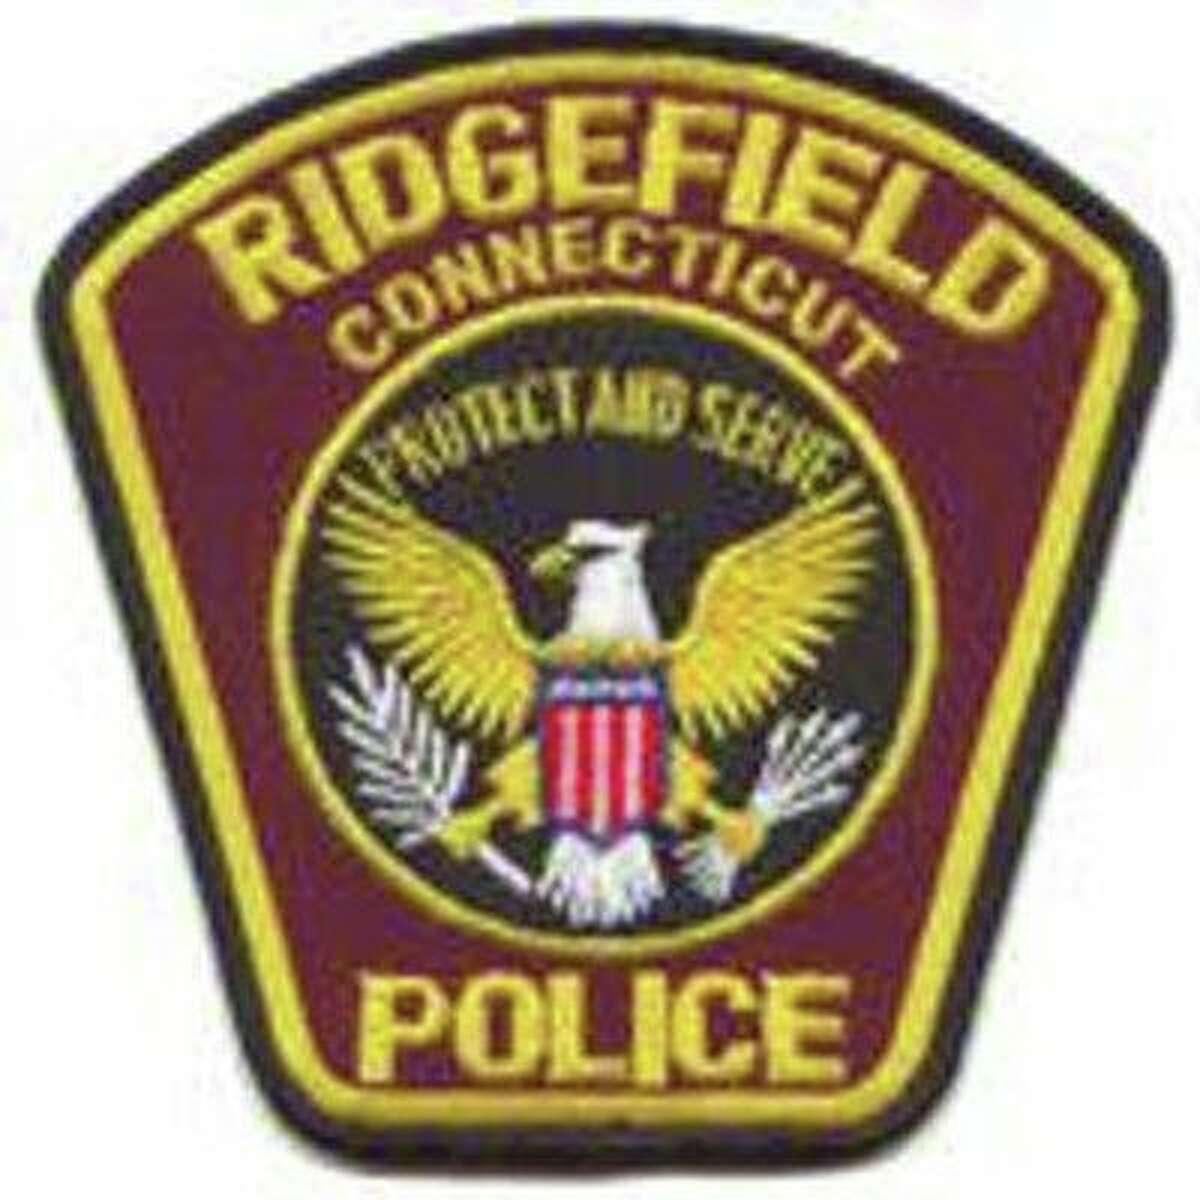 Ridgefield police patch